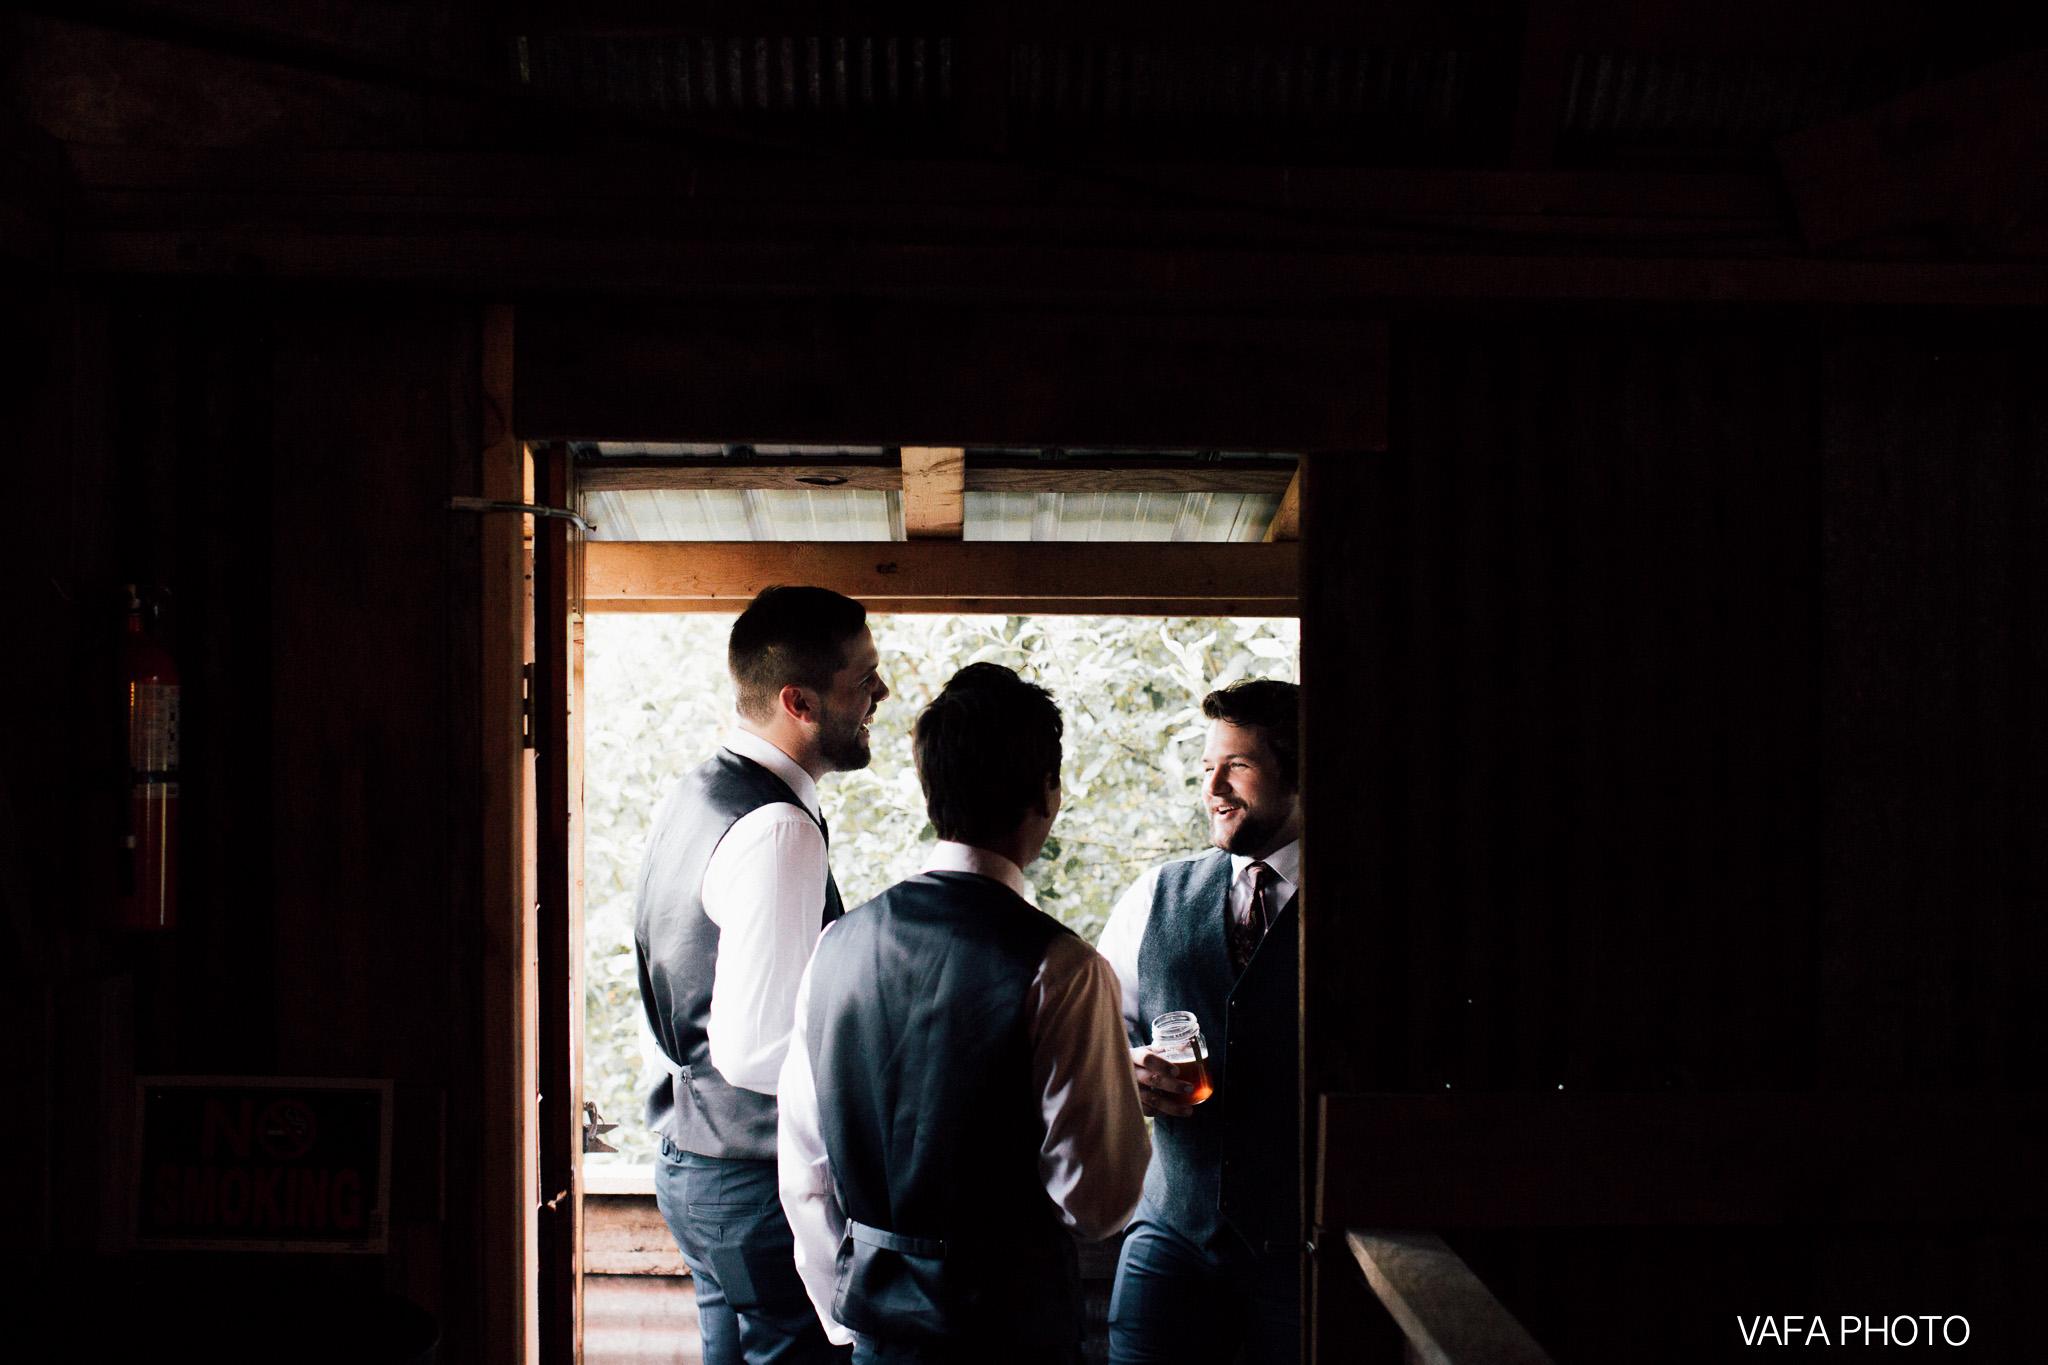 Belsolda-Farm-Wedding-Christy-Eric-Vafa-Photo-676.jpg